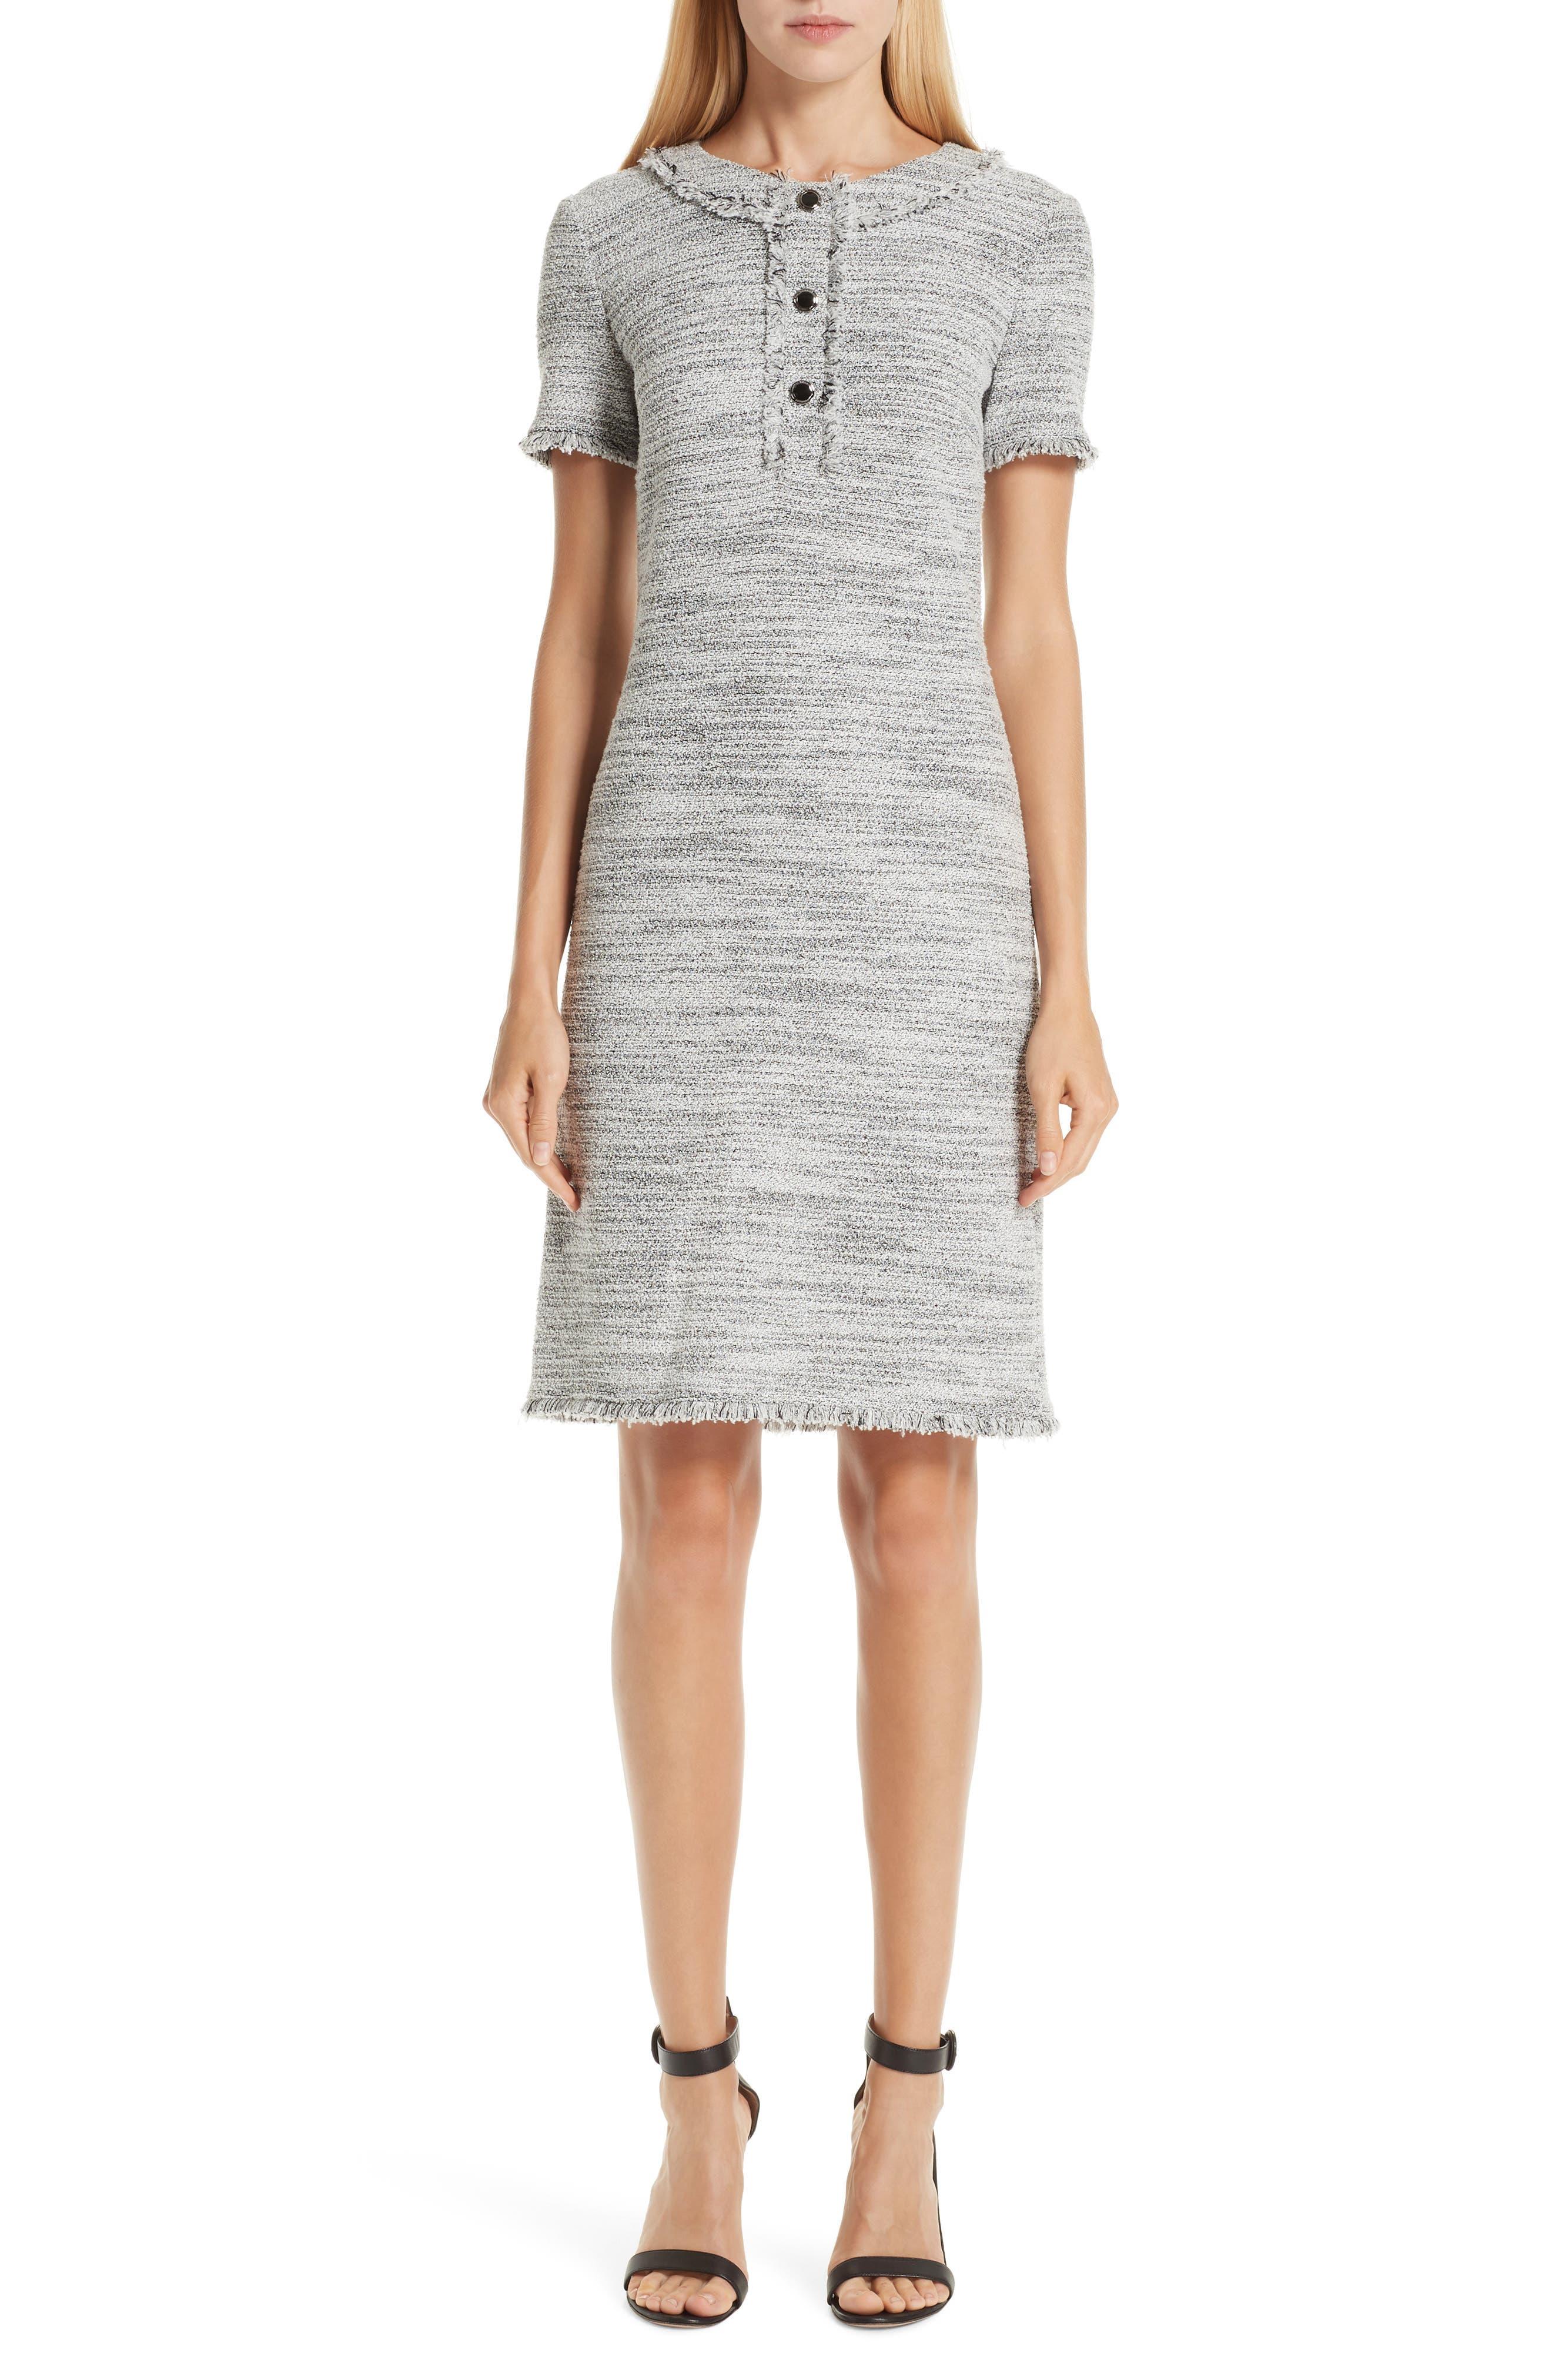 ST. JOHN COLLECTION Eaton Place Tweed Knit Dress, Main, color, CAVIAR/ CREAM